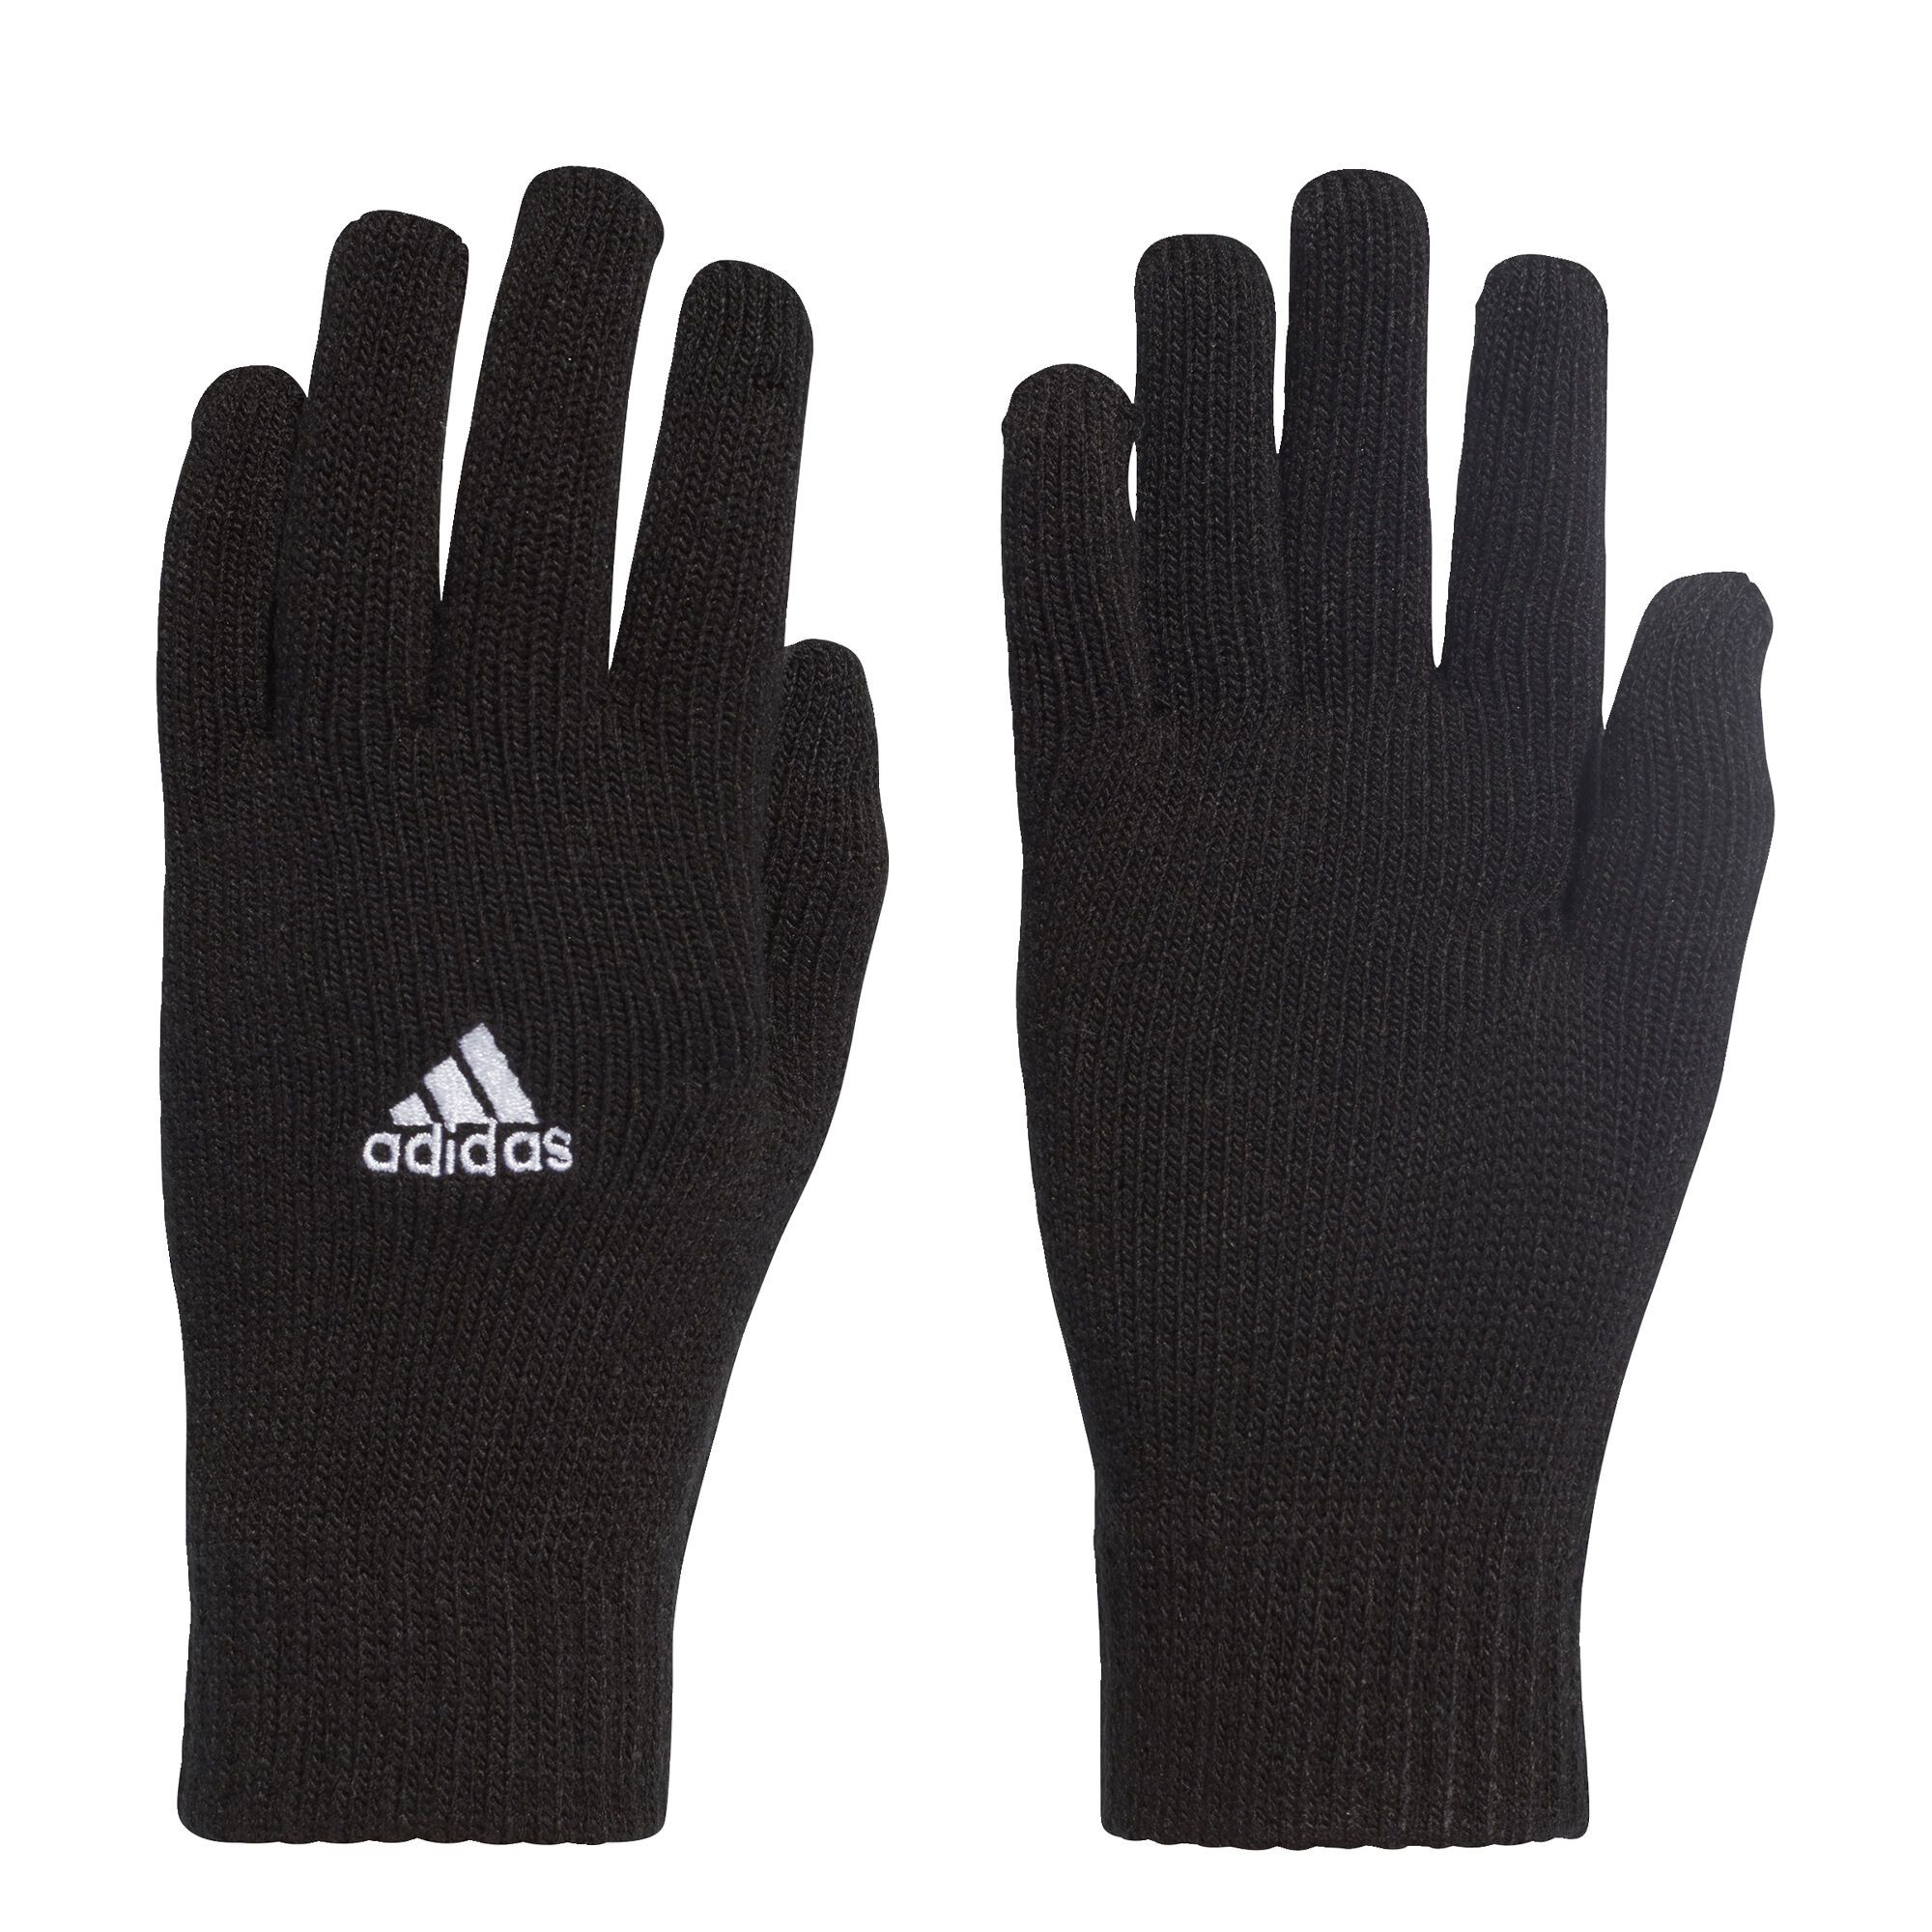 adidas TIRO Handschoenen Zwart Wit